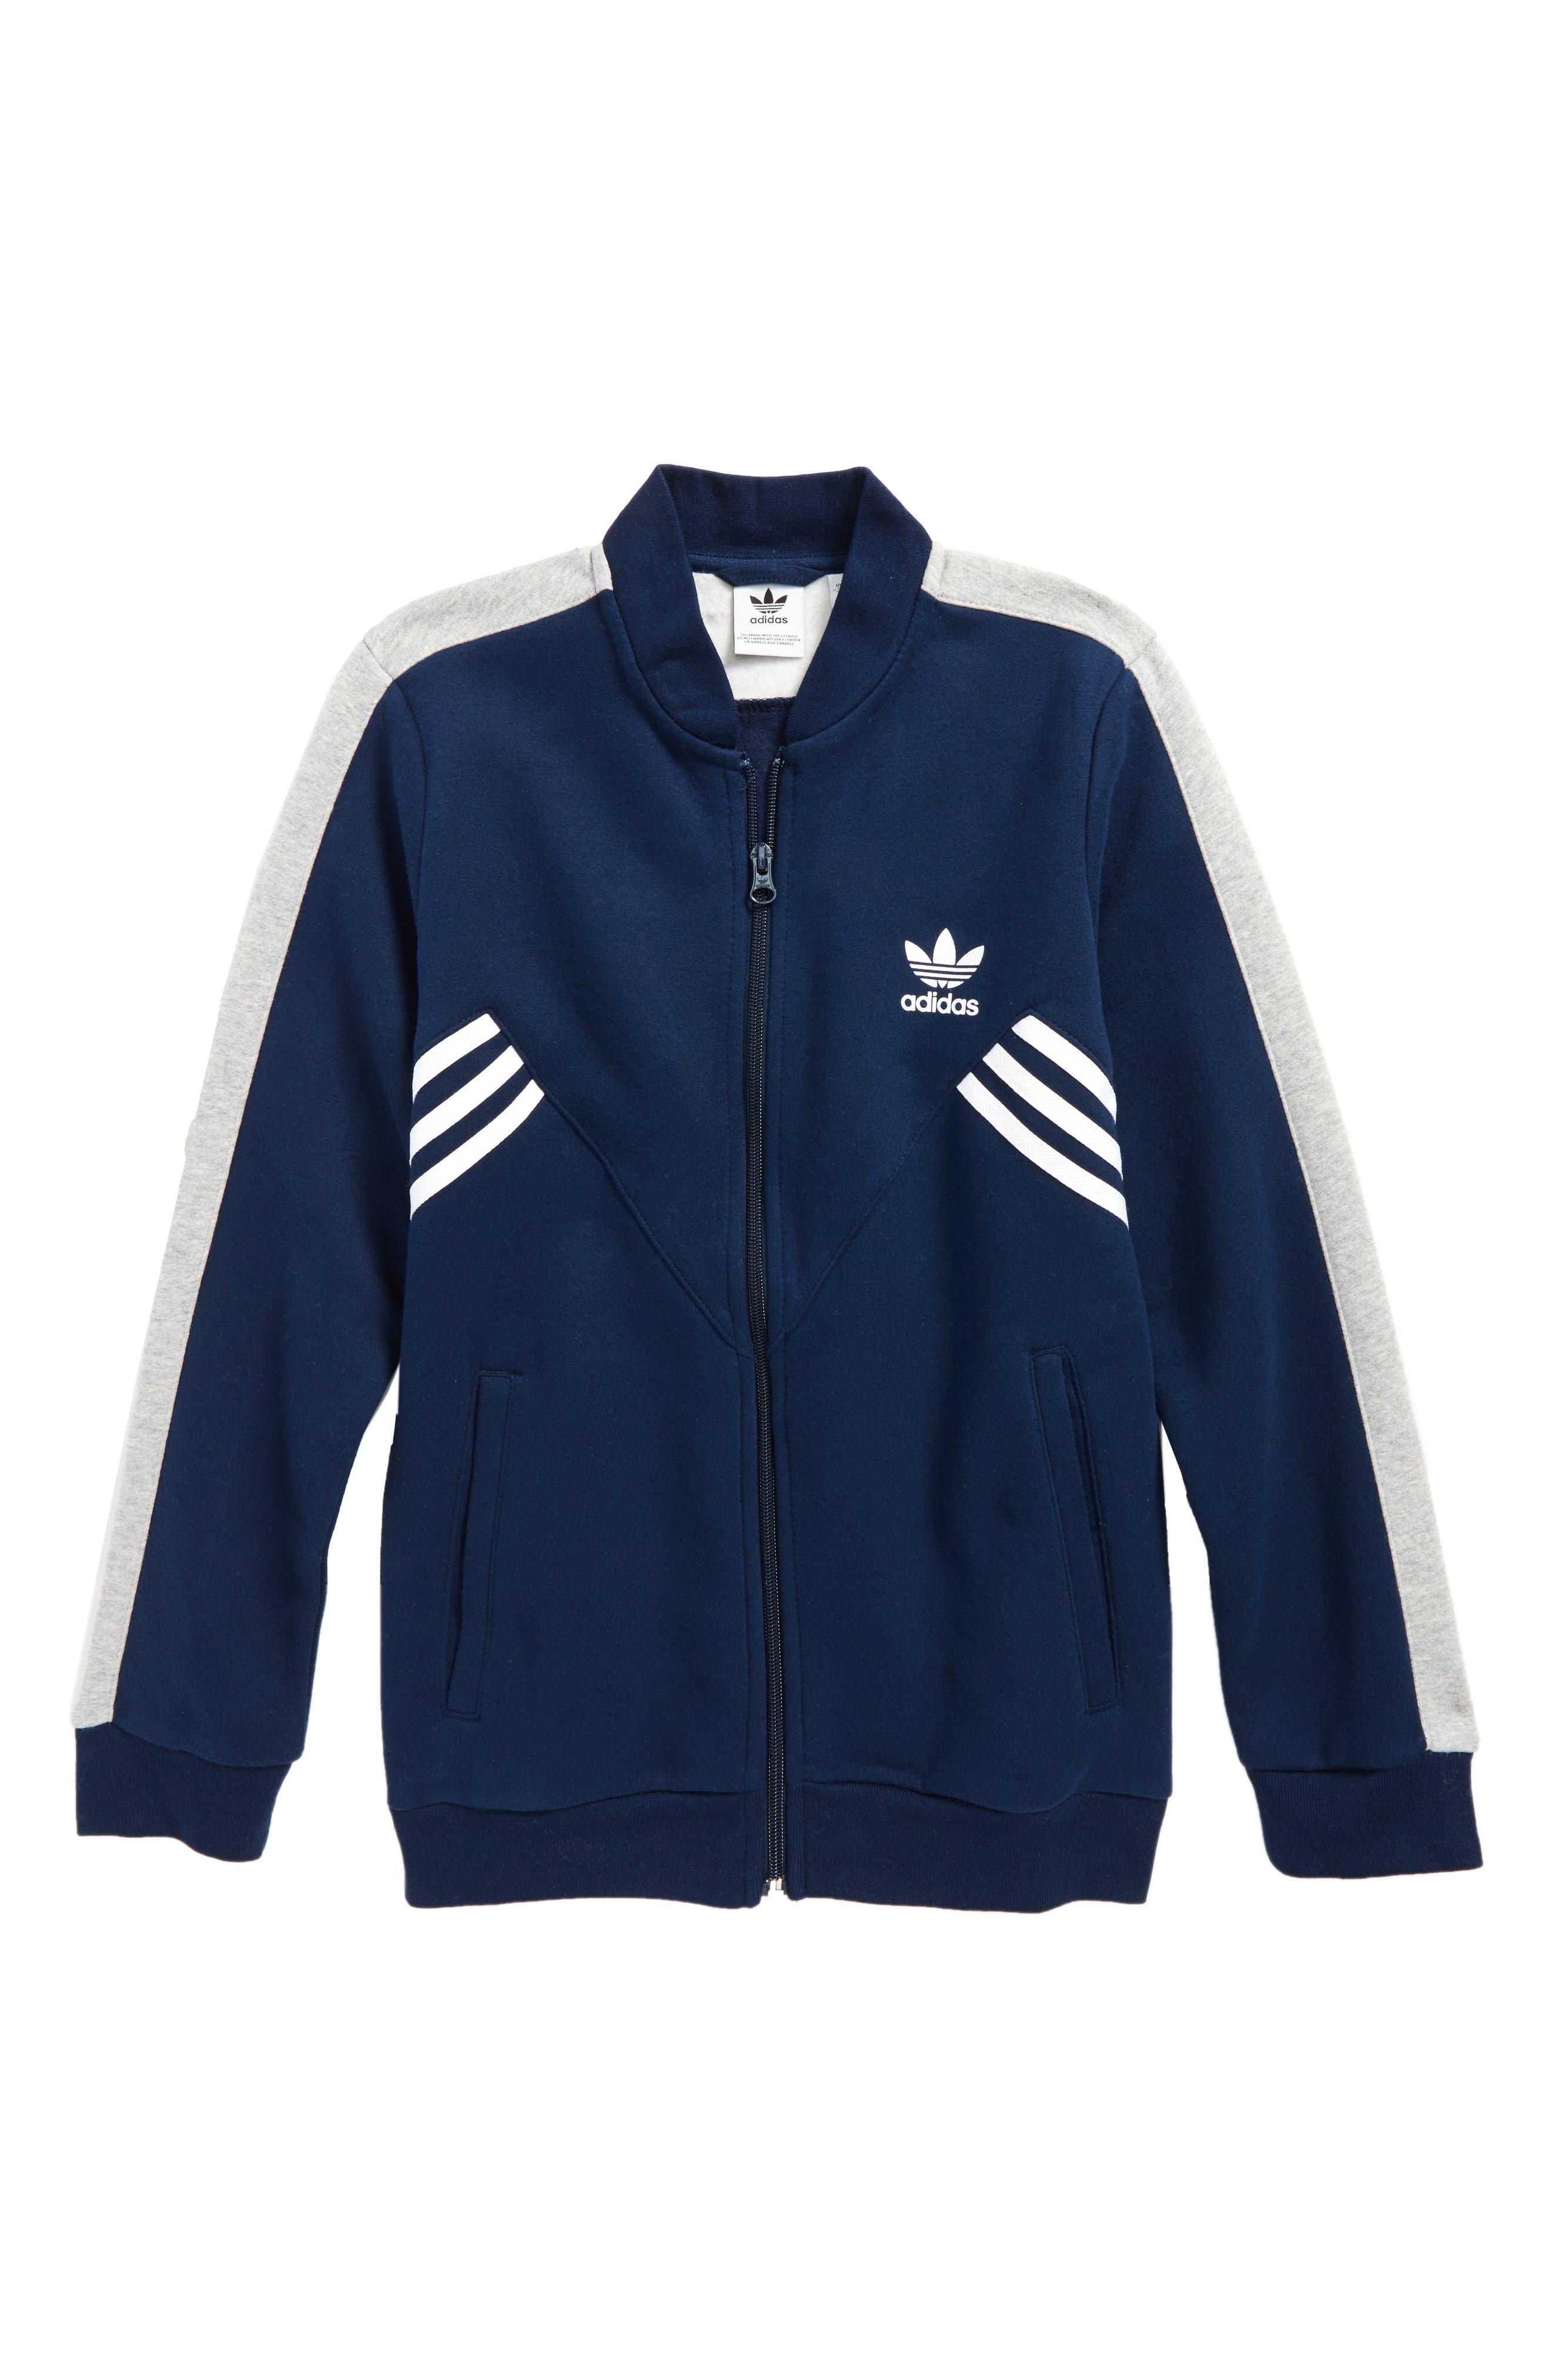 adidas SST Track Jacket,                         Main,                         color, 415